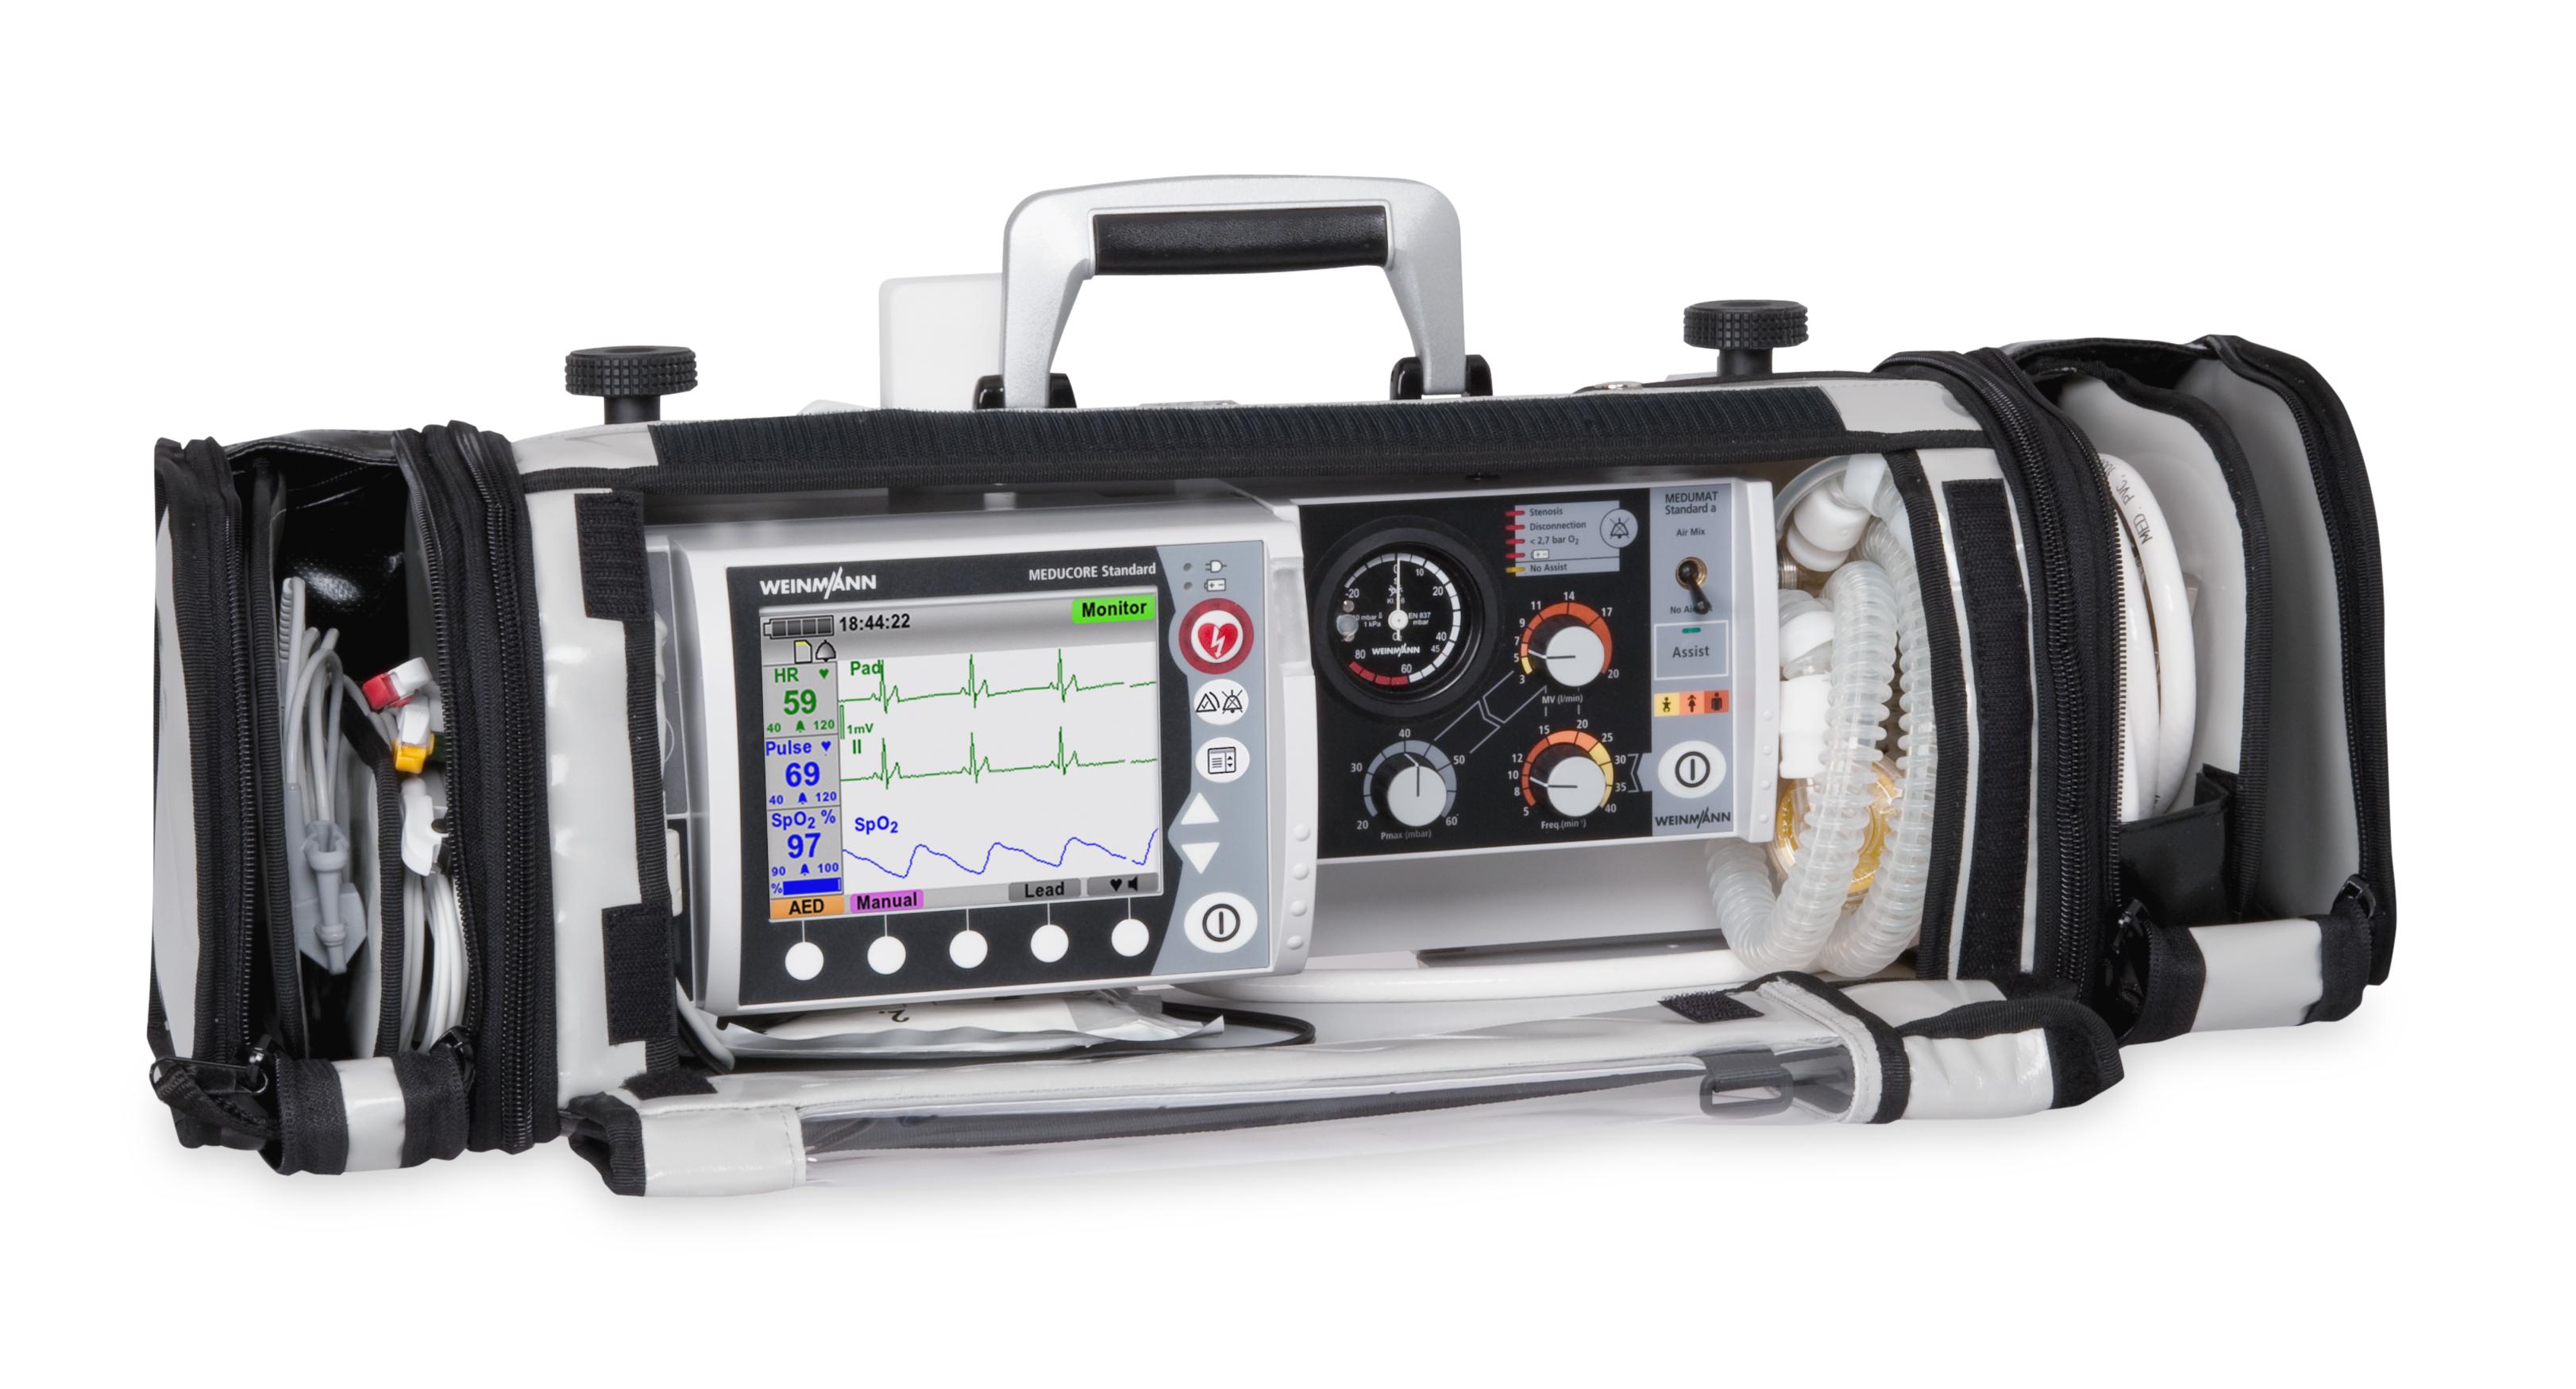 Defibrylator Meducore Standard Basic + Respirator Medumat Standard A na Life-Base 1 NG XL